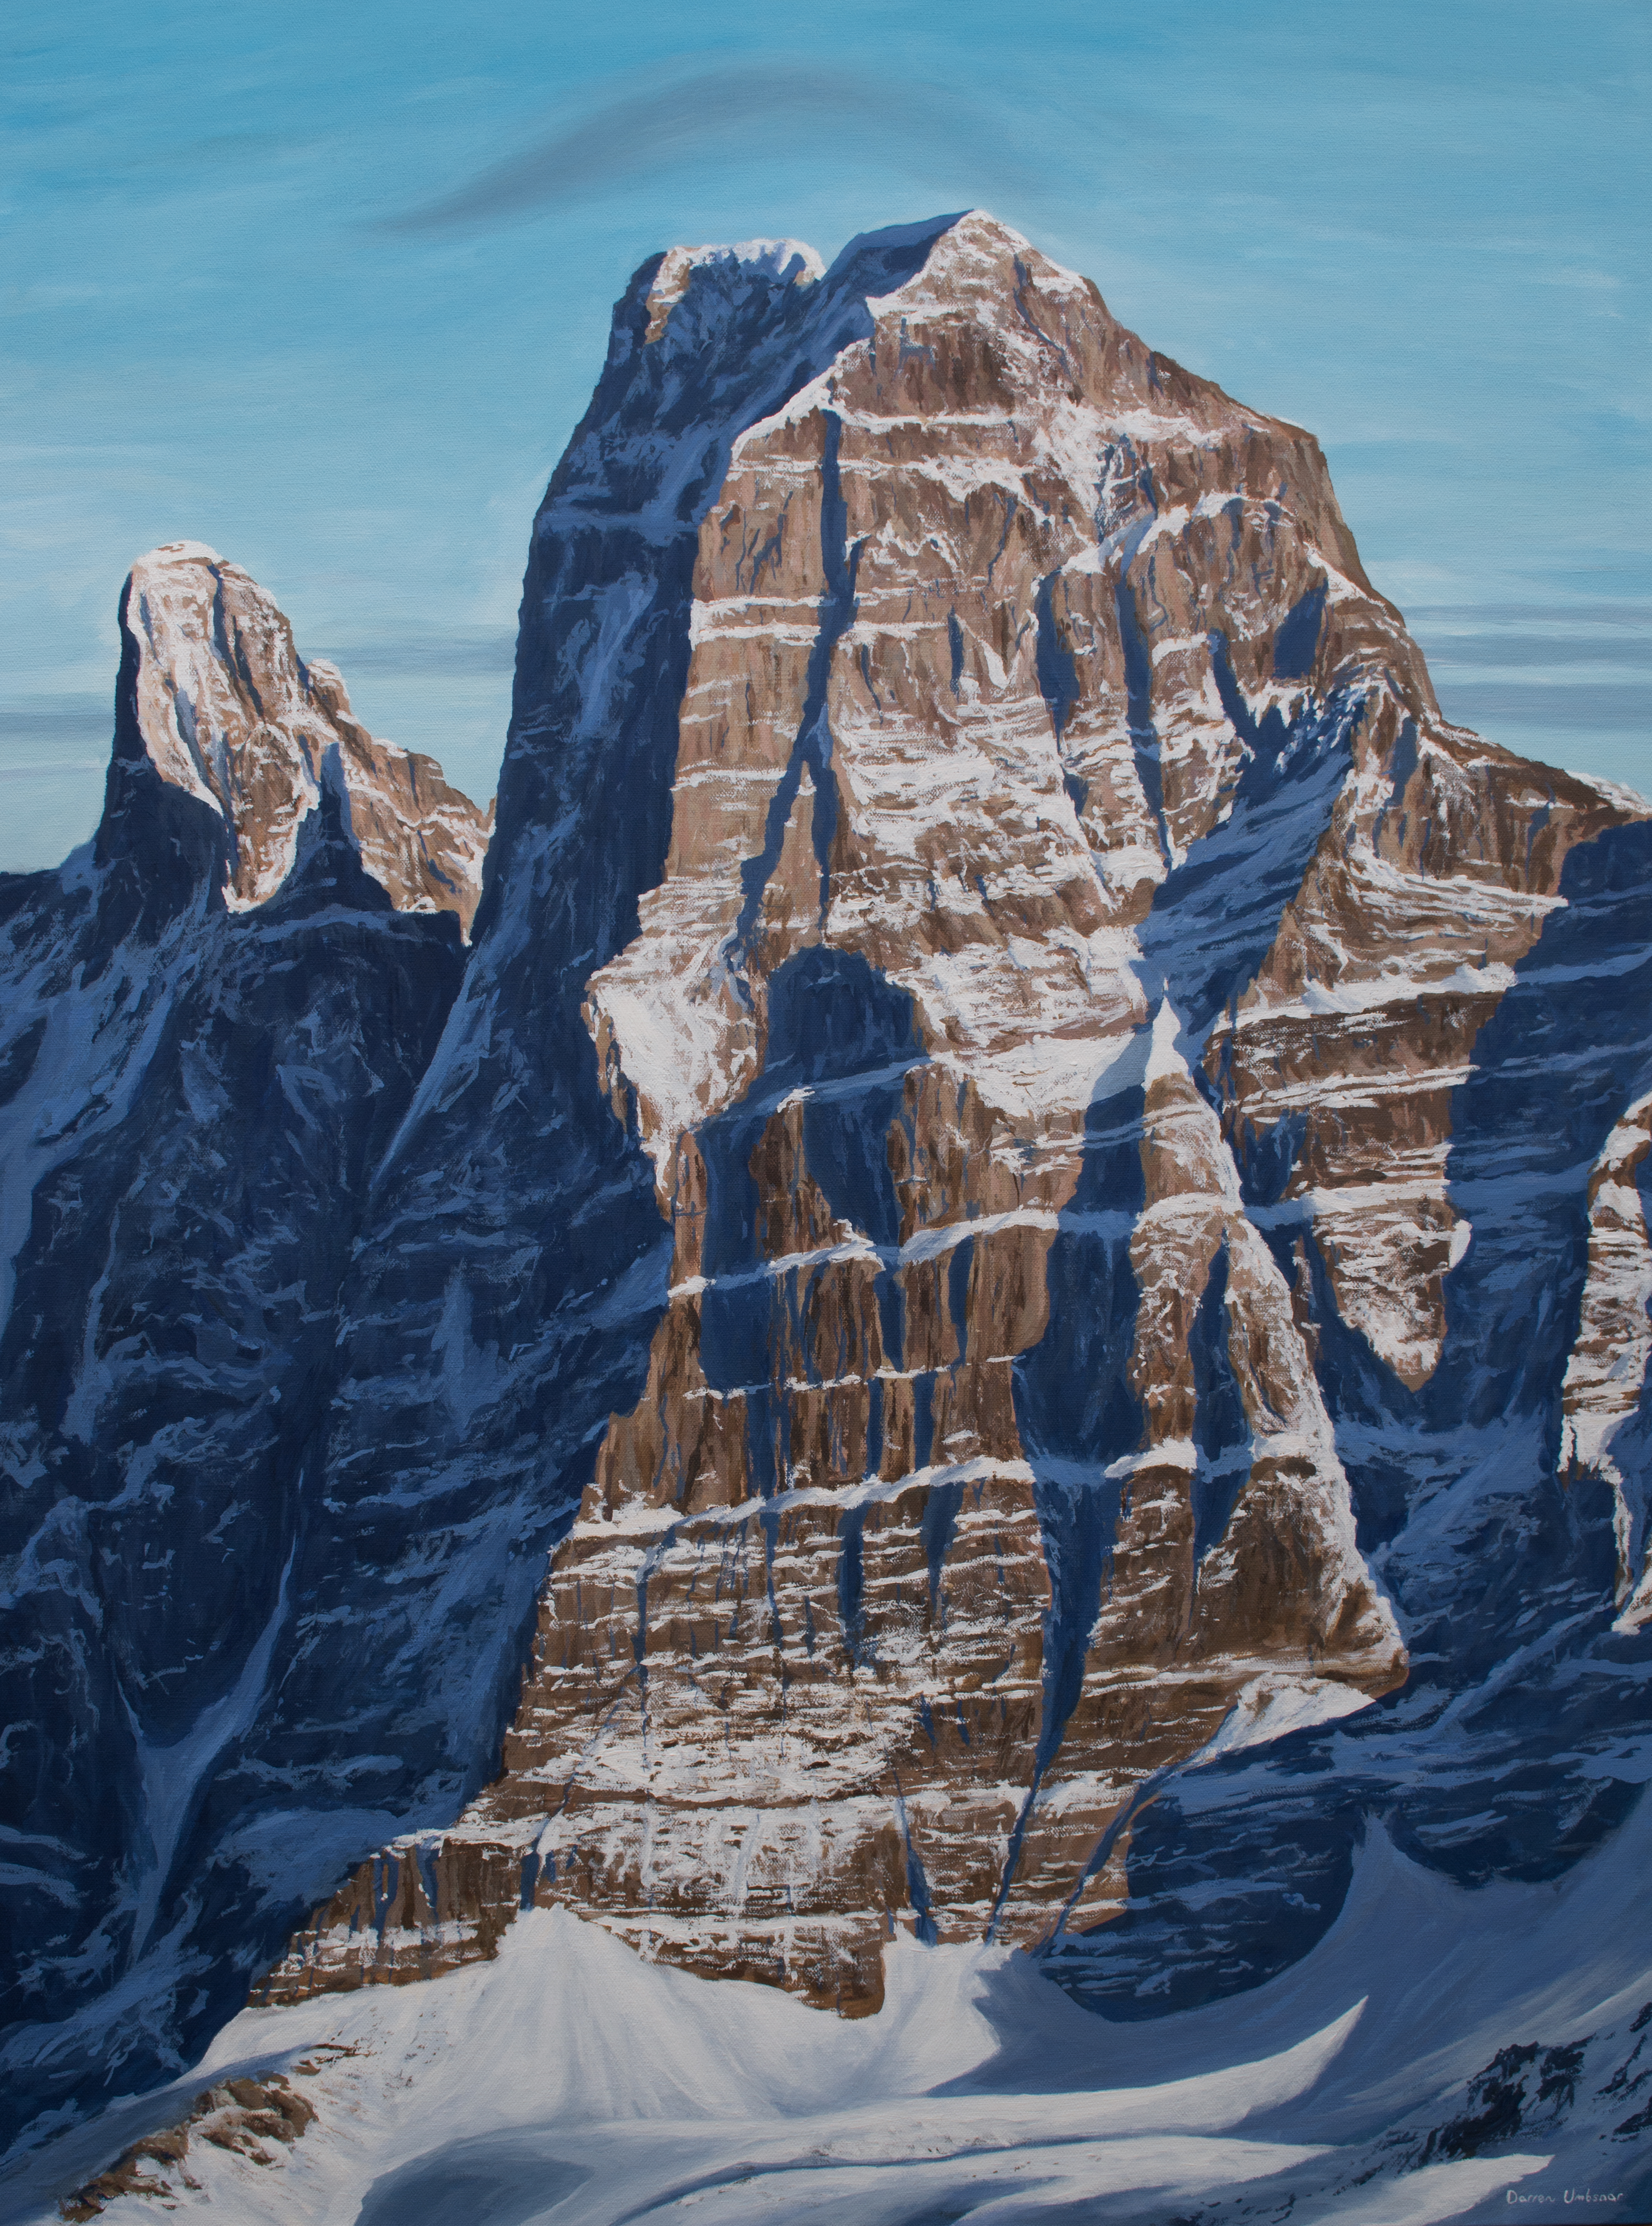 Mount Geikie